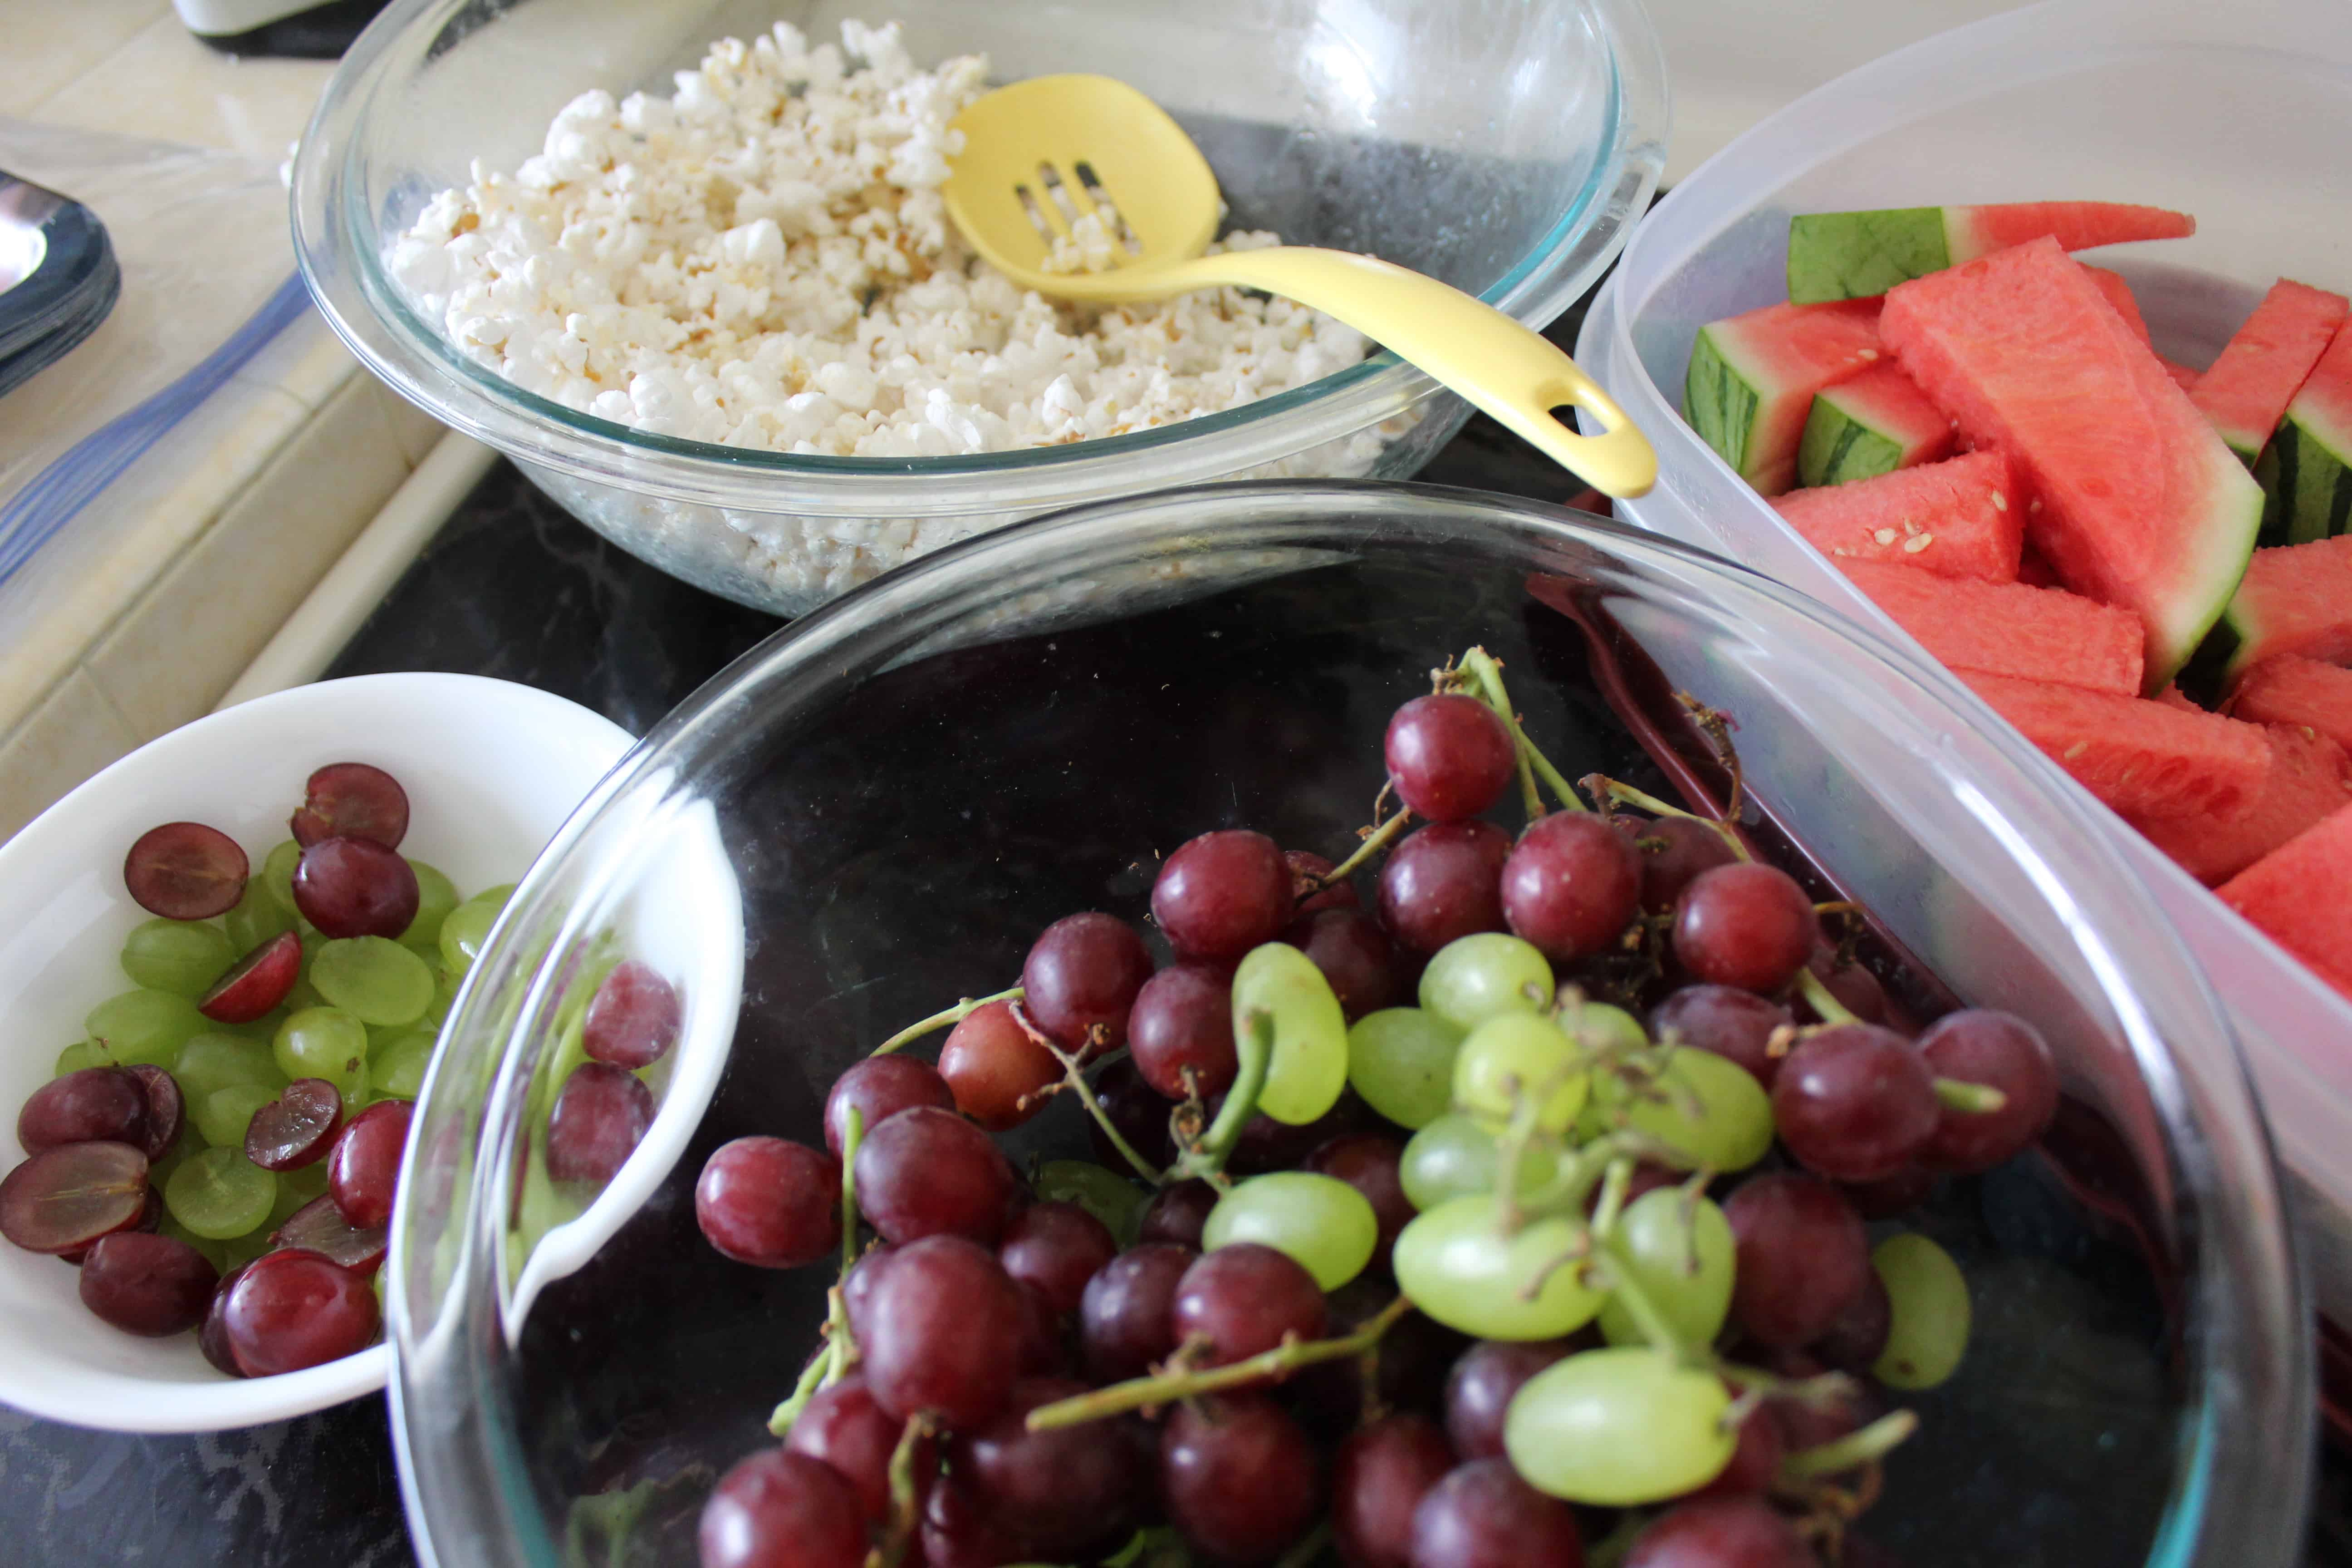 grapes, popcorn, and watermelon